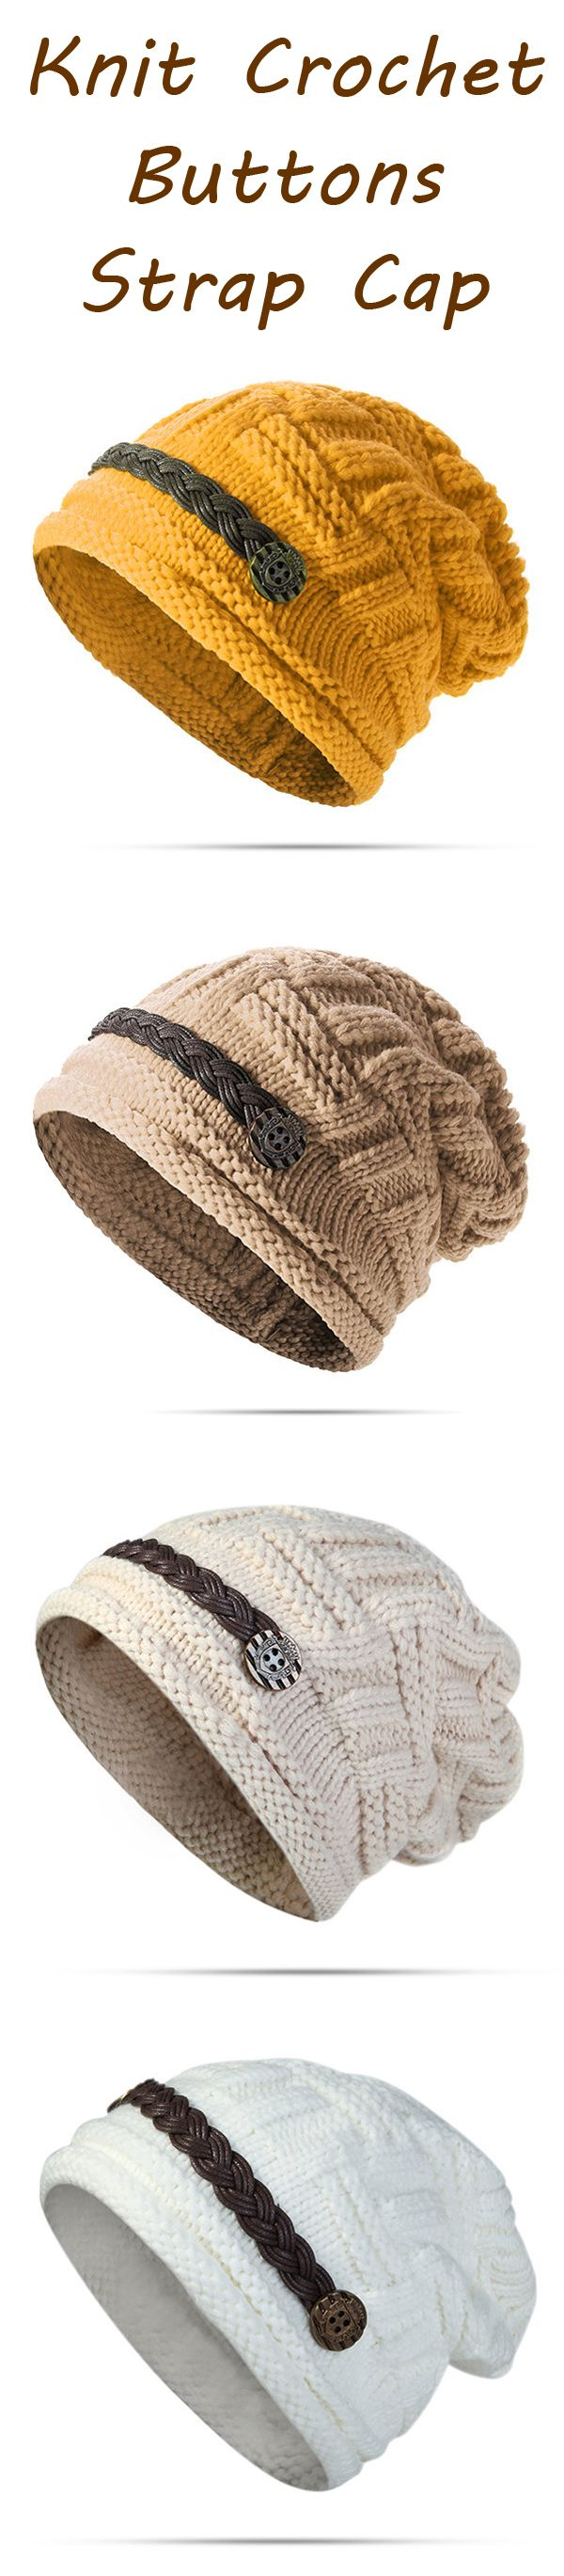 Mejores 44 imágenes de Knitting ideas en Pinterest | Bufandas ...